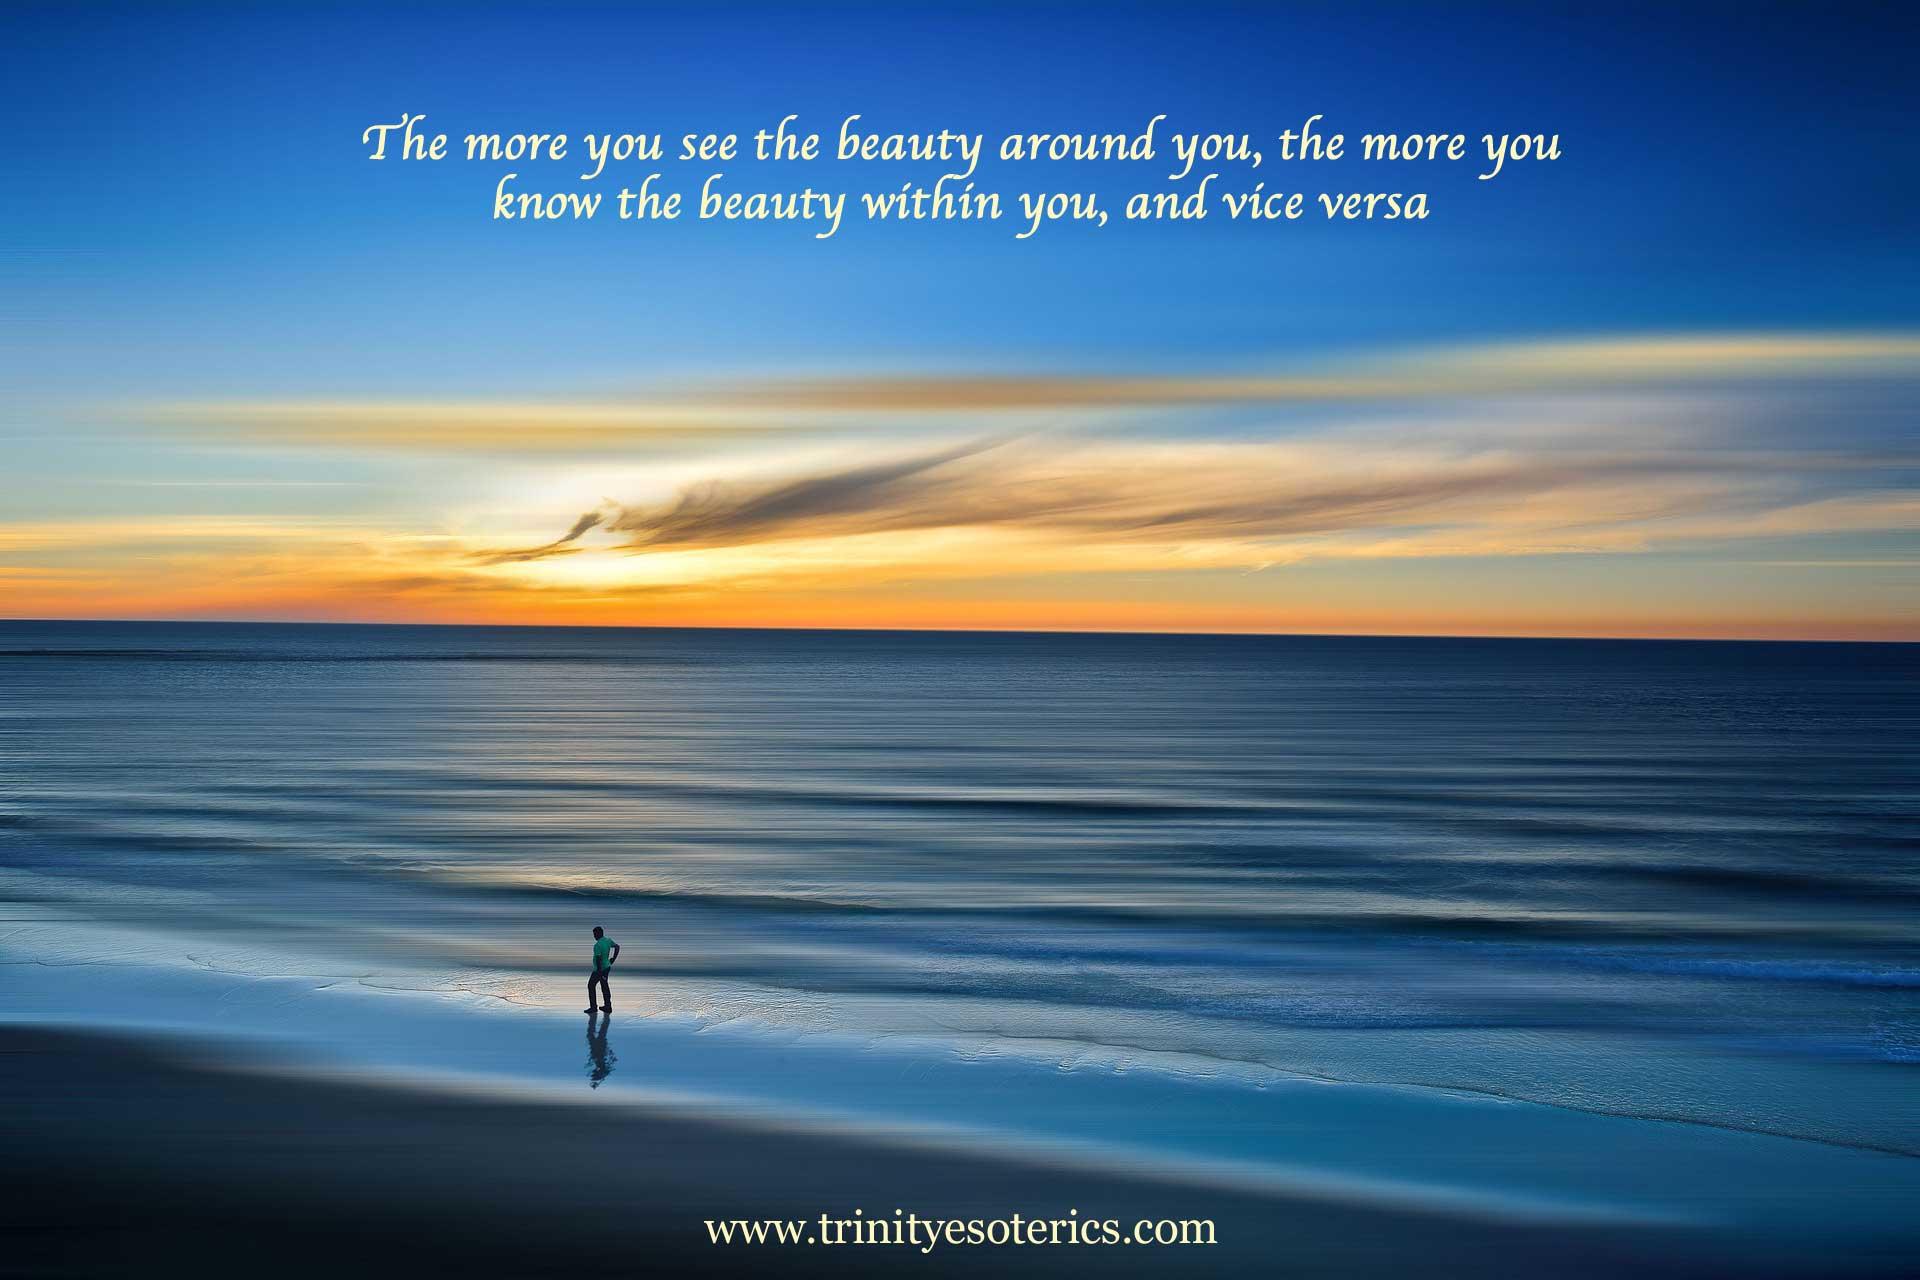 man reflected on beautiful beach trinity esoterics